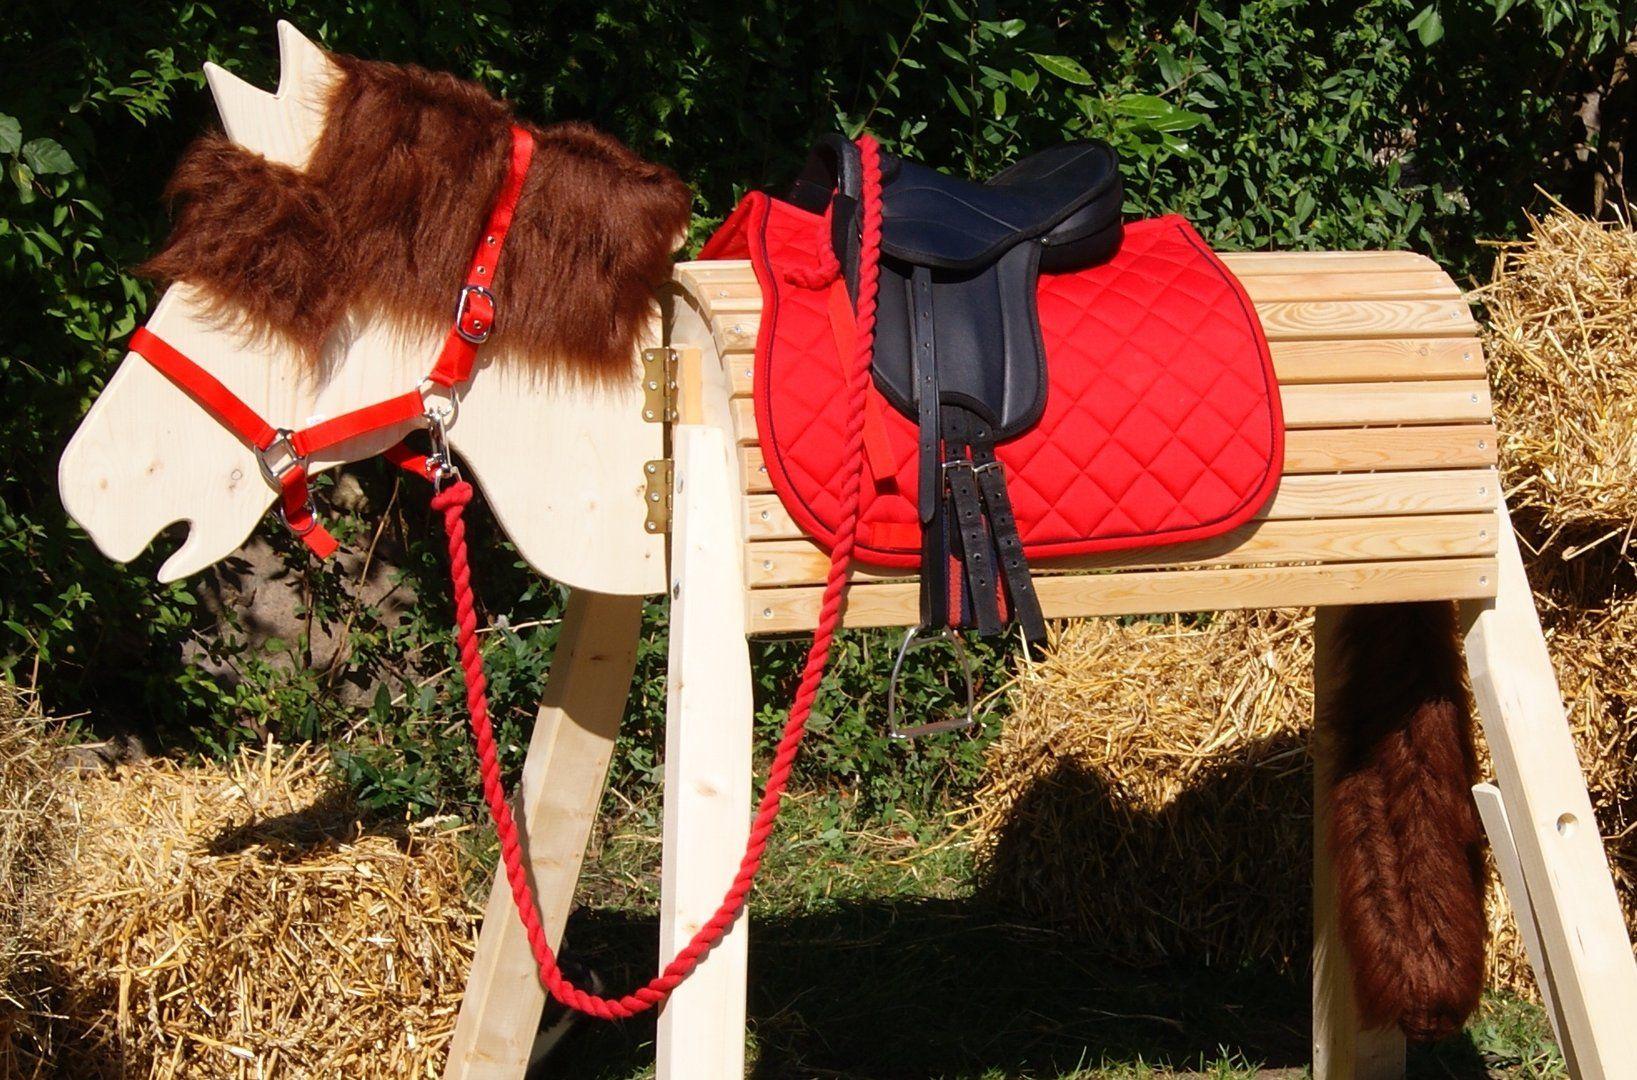 Komplettset Mia 100 Cm Das Sparset Holzpferd Holzpferd Garten Satteldecke